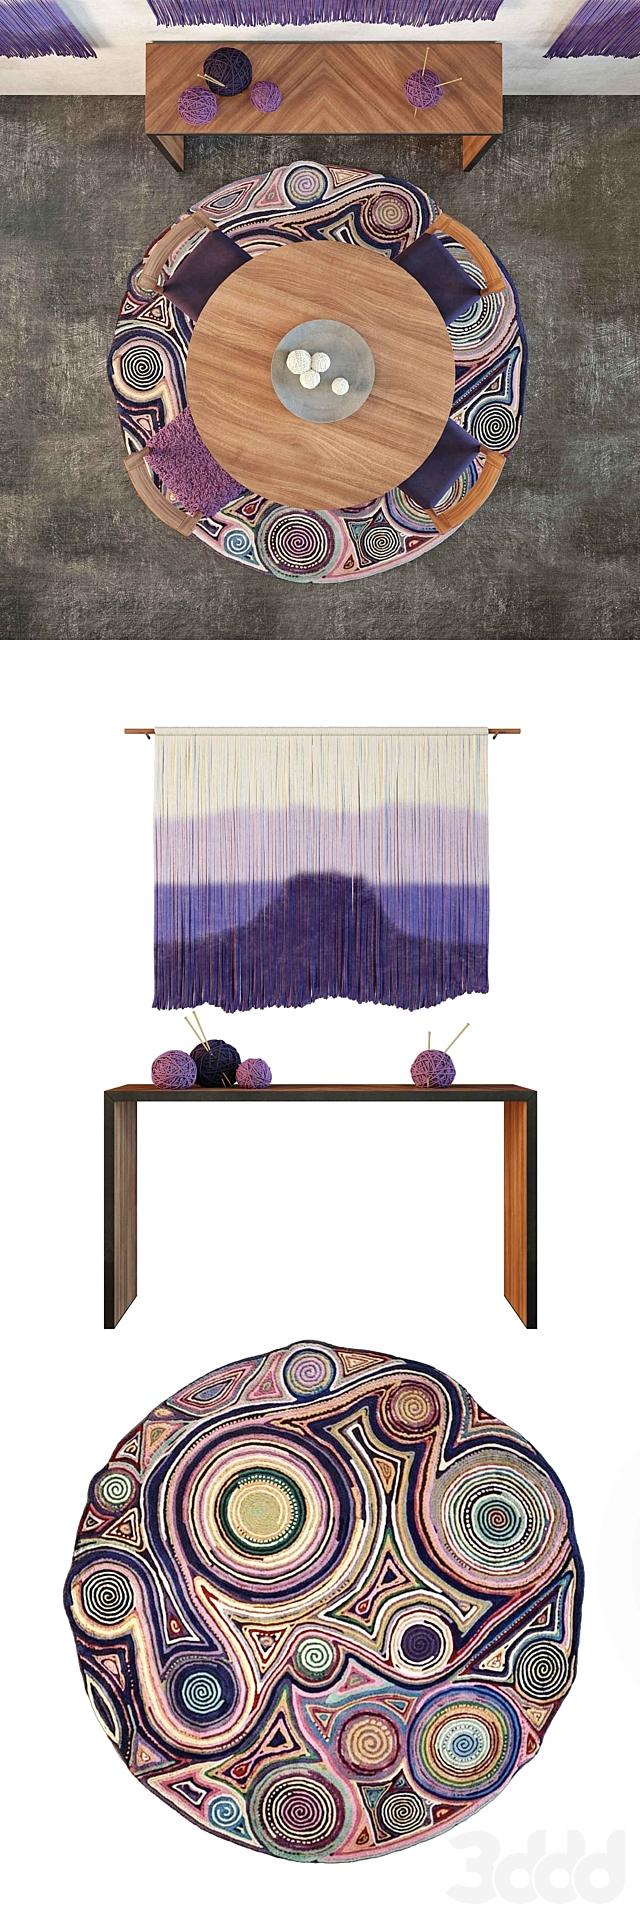 Roost Teak Table & BbL Tapestry set